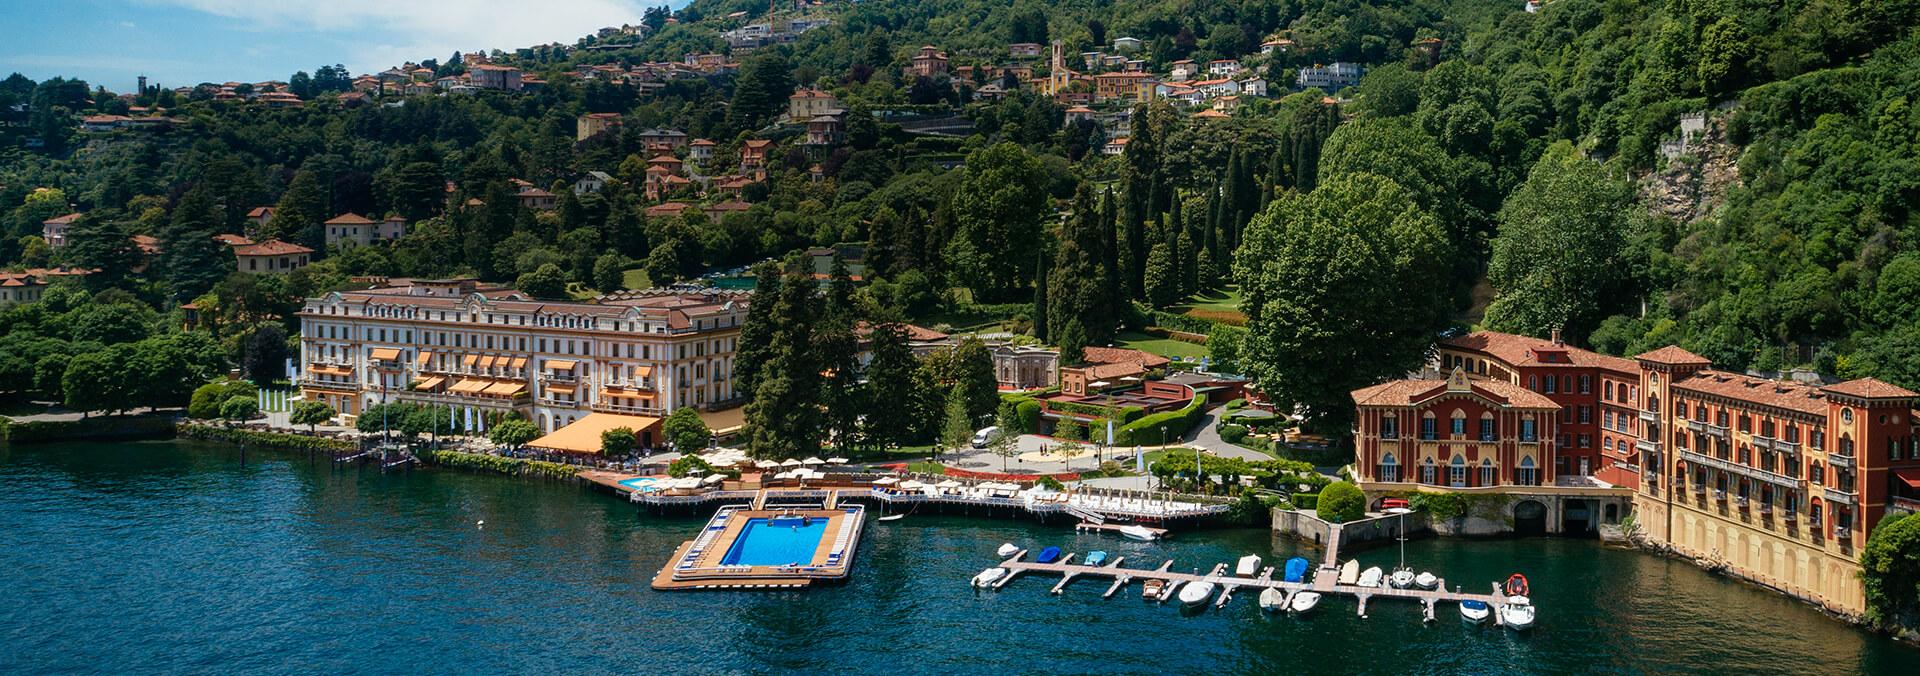 Concorso d'Eleganza Villa d'Este - Newsletter